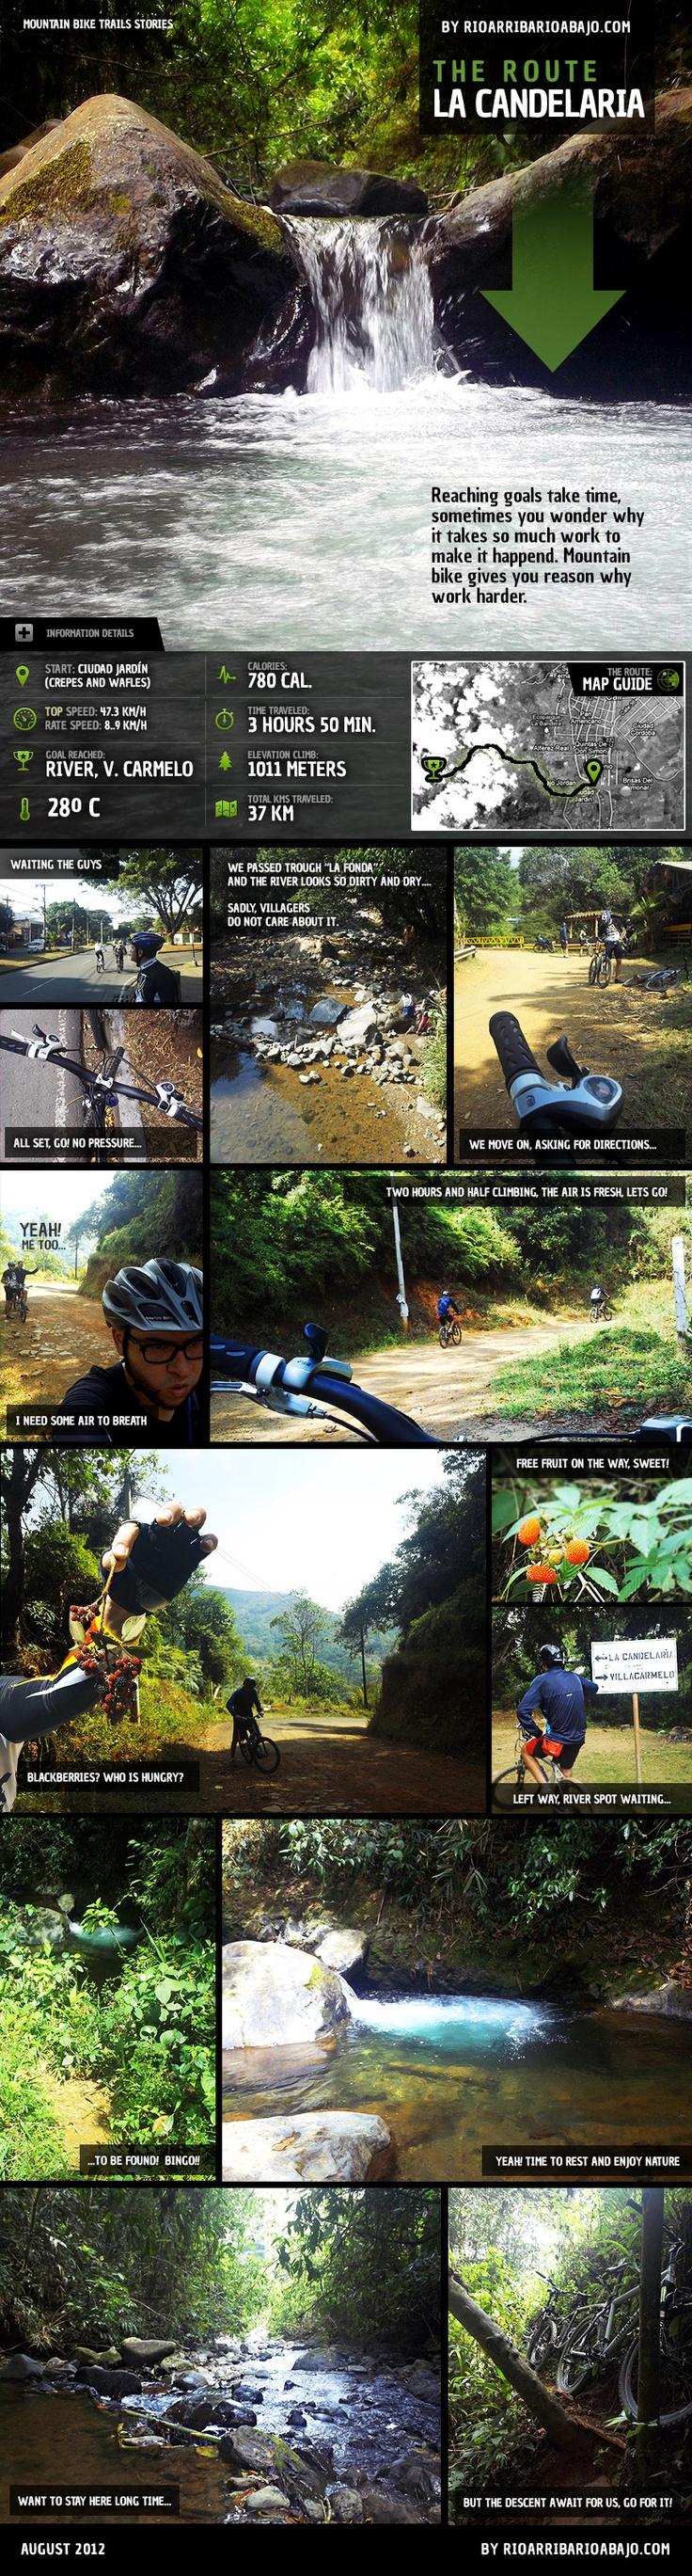 Ruta: La Candelaria, Awesome River spot founded! mountain bike trails, enjoy!